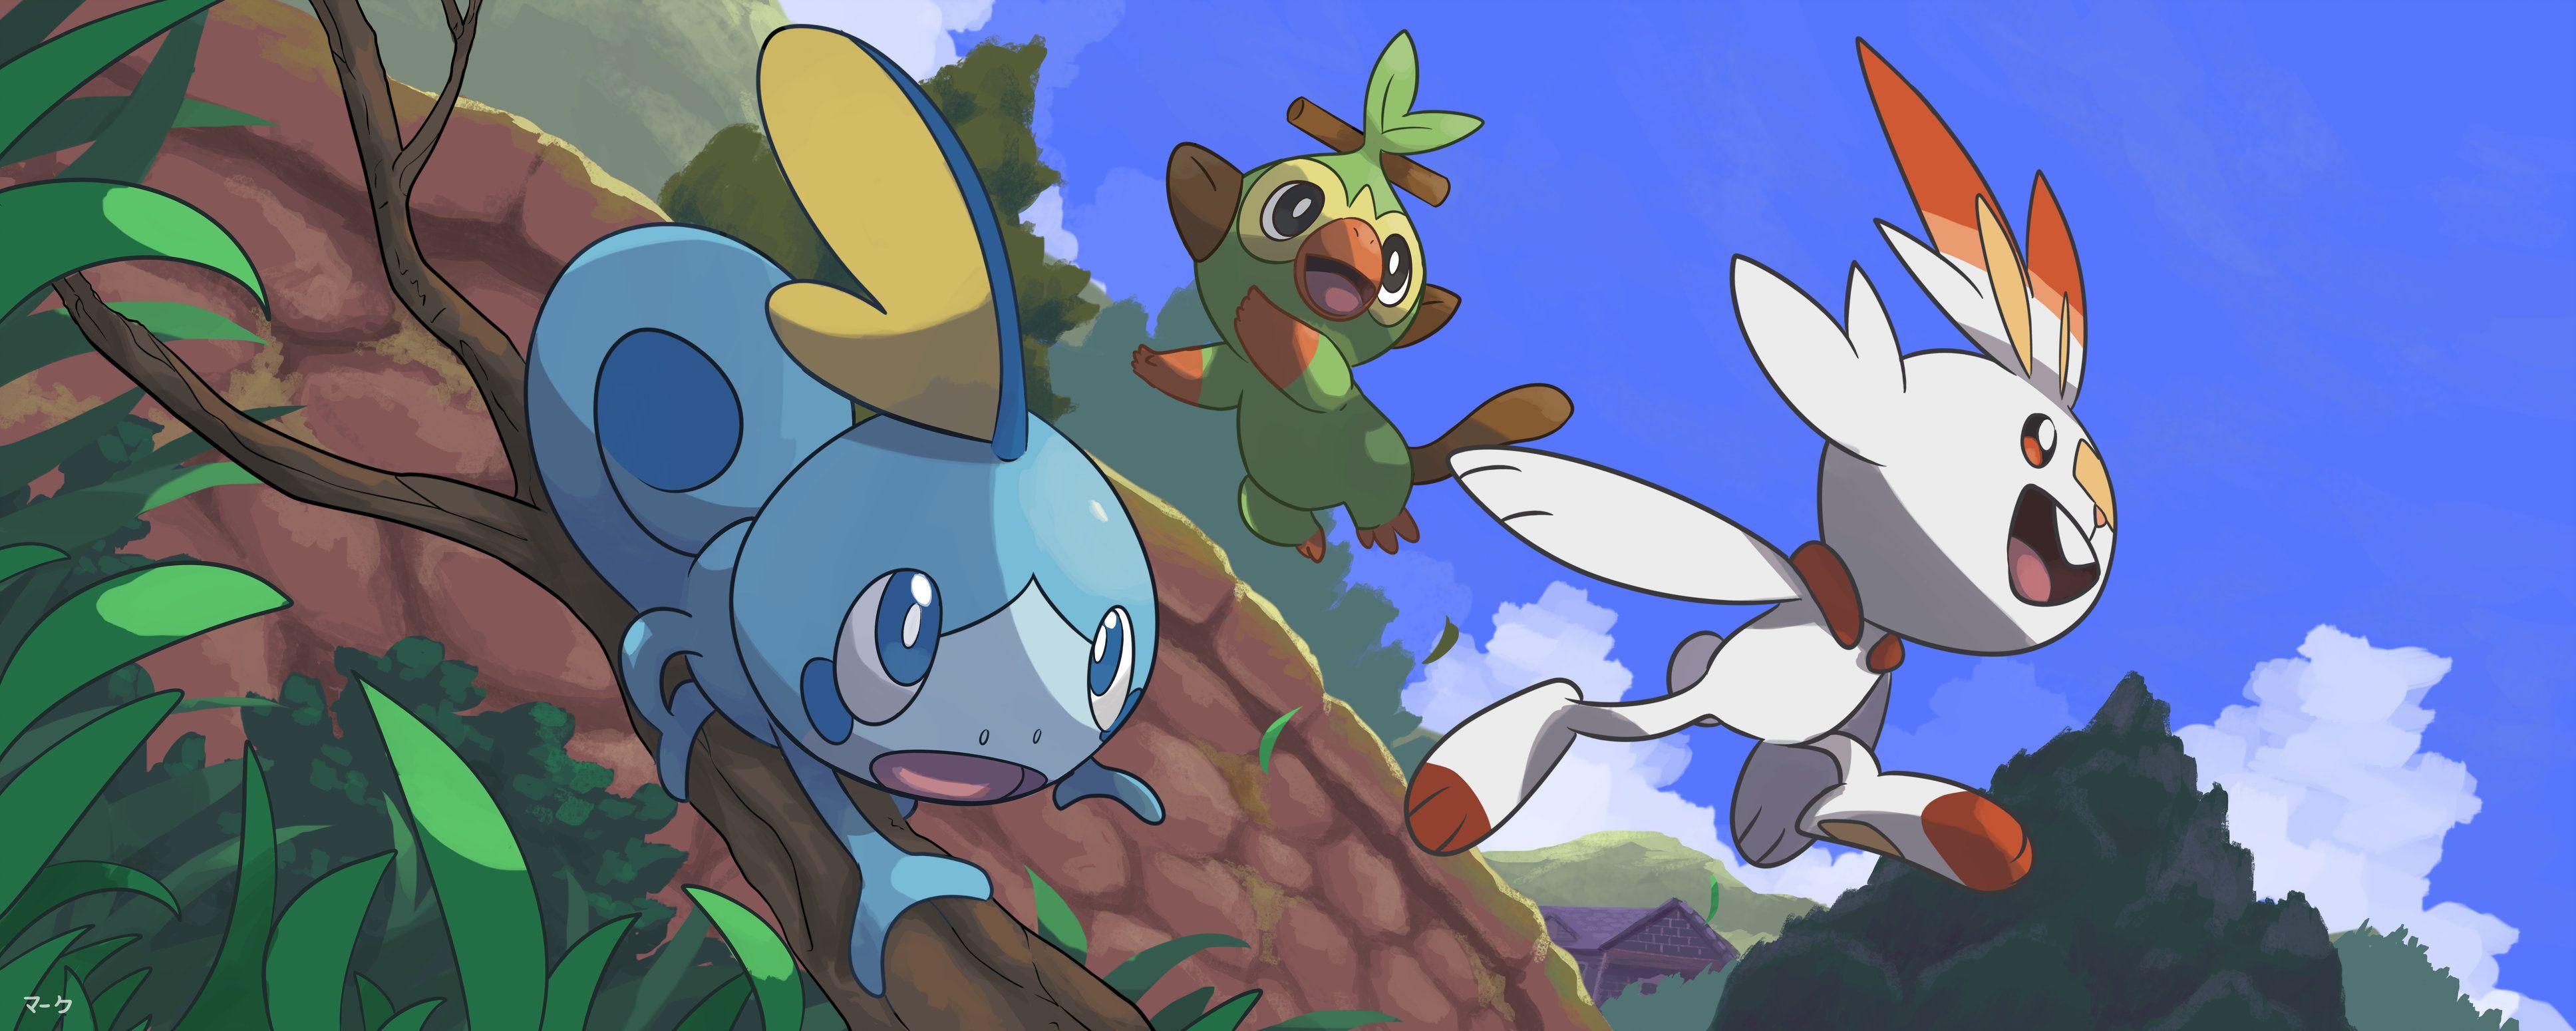 Free Download Poka C Mon Sword And Shield Hd Wallpaper Pokemon Hd